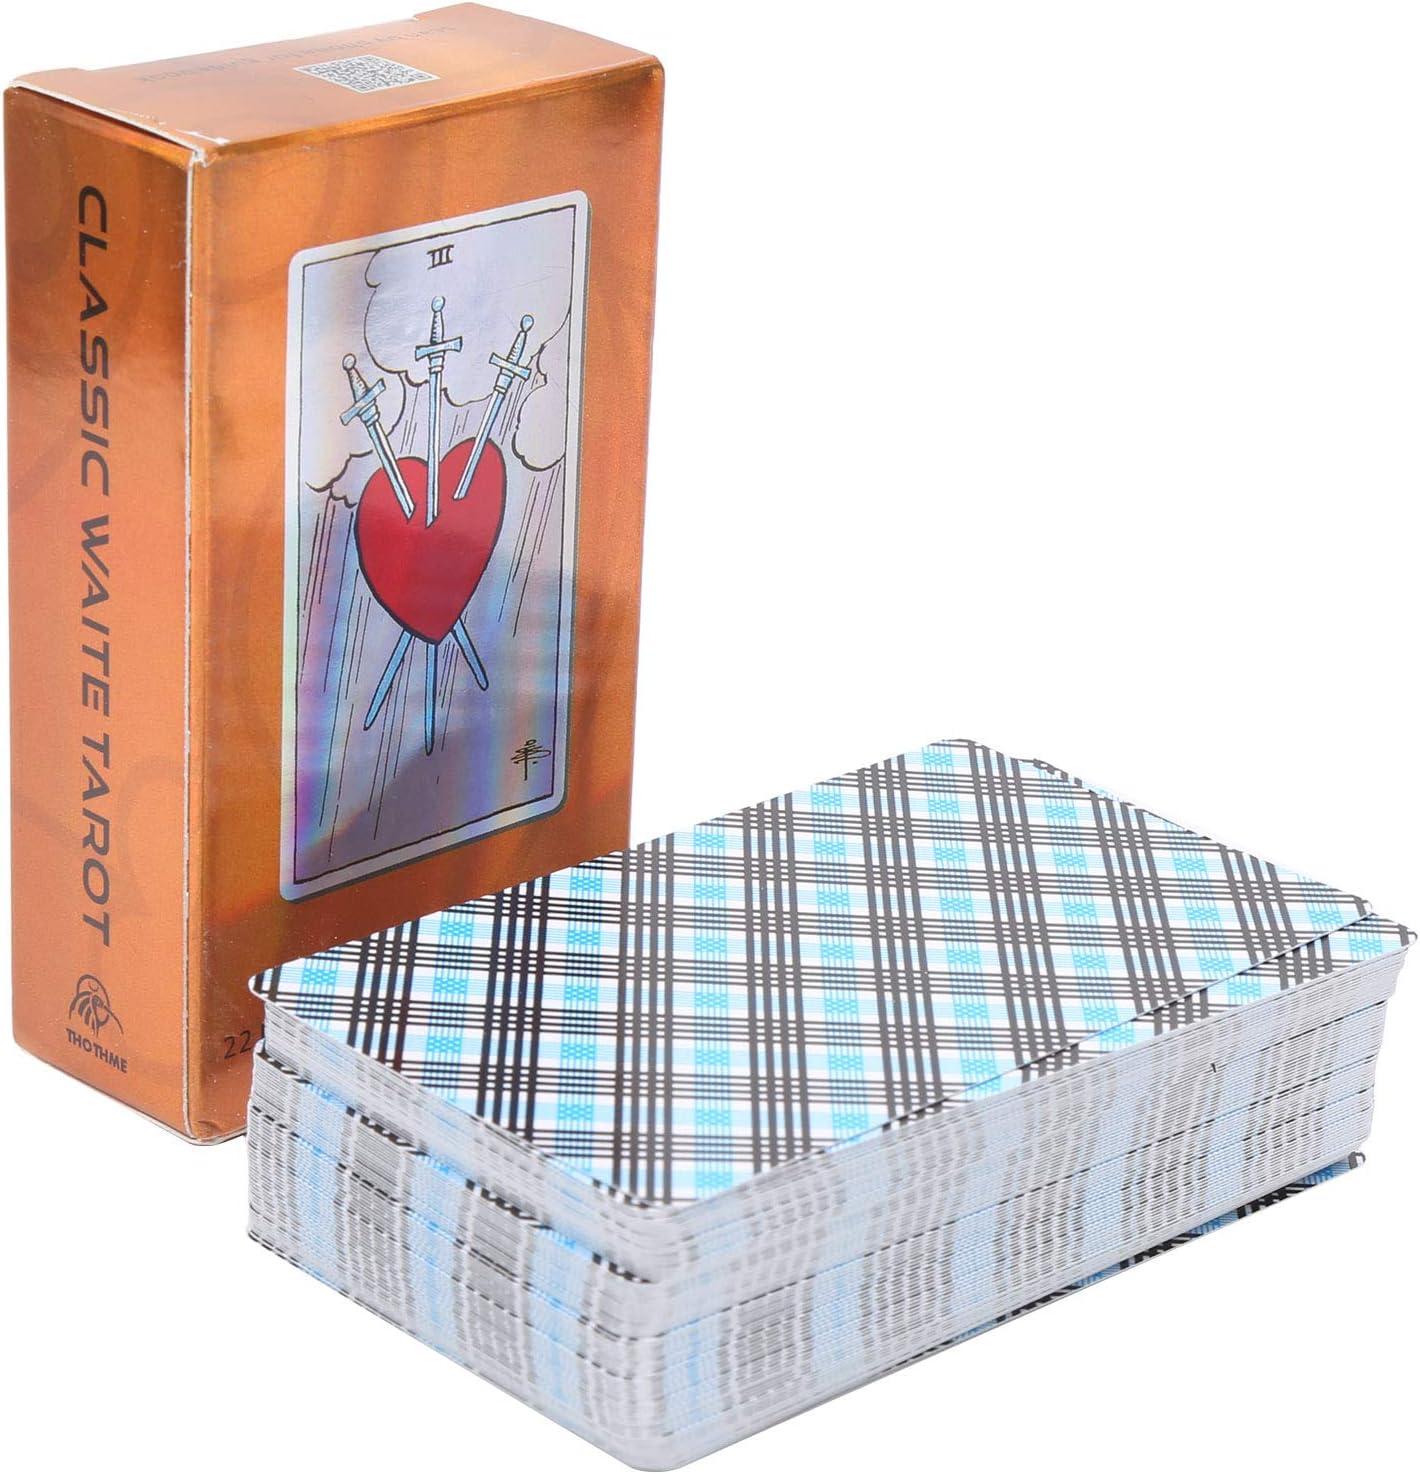 Junlucki Tarot Cards Deck Bright Card Outlet SALE Finally popular brand Divination Color Fate